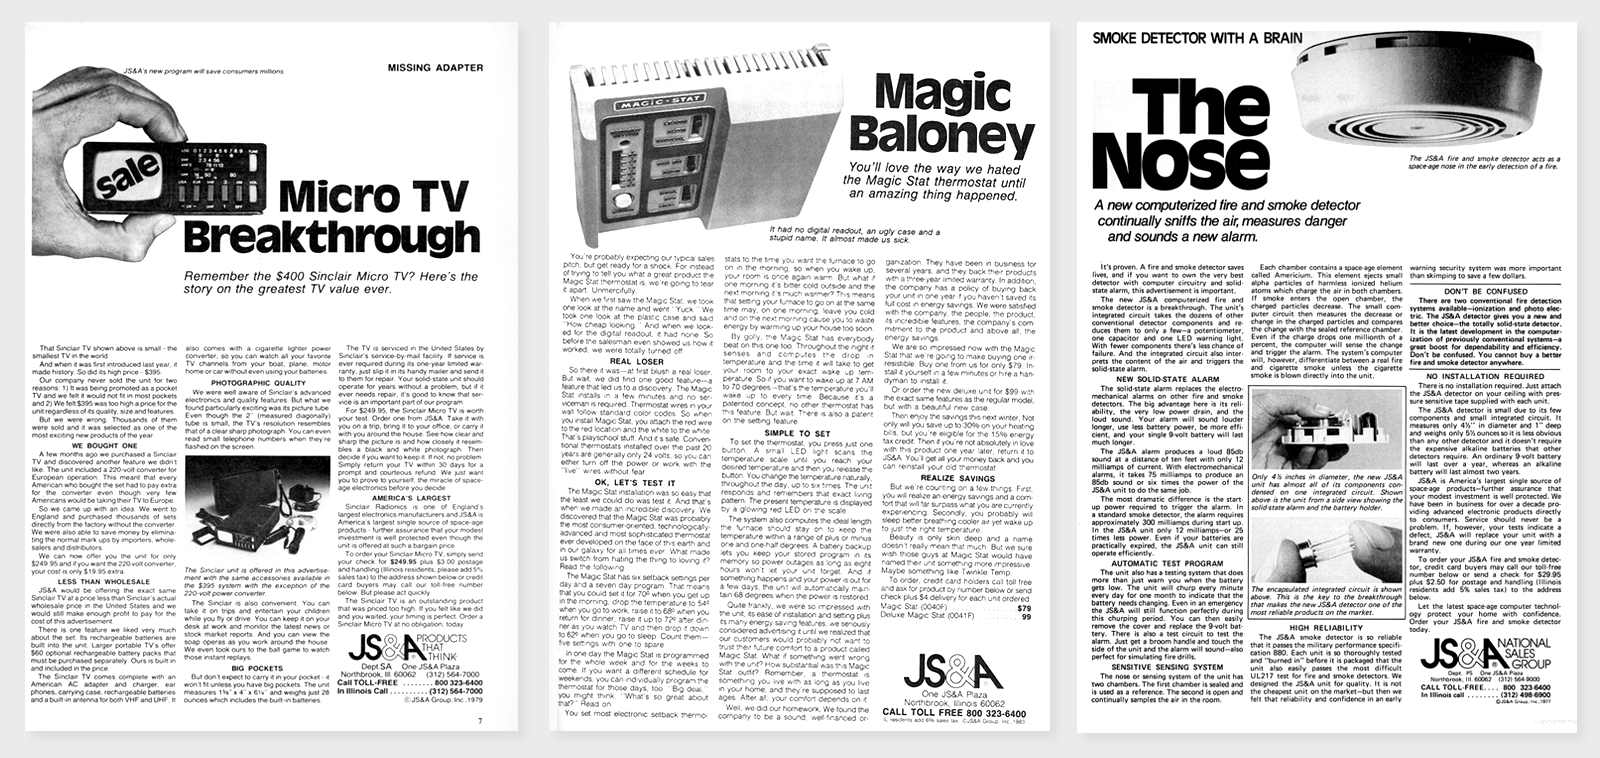 Vintage Ads or Analog Landing Pages?